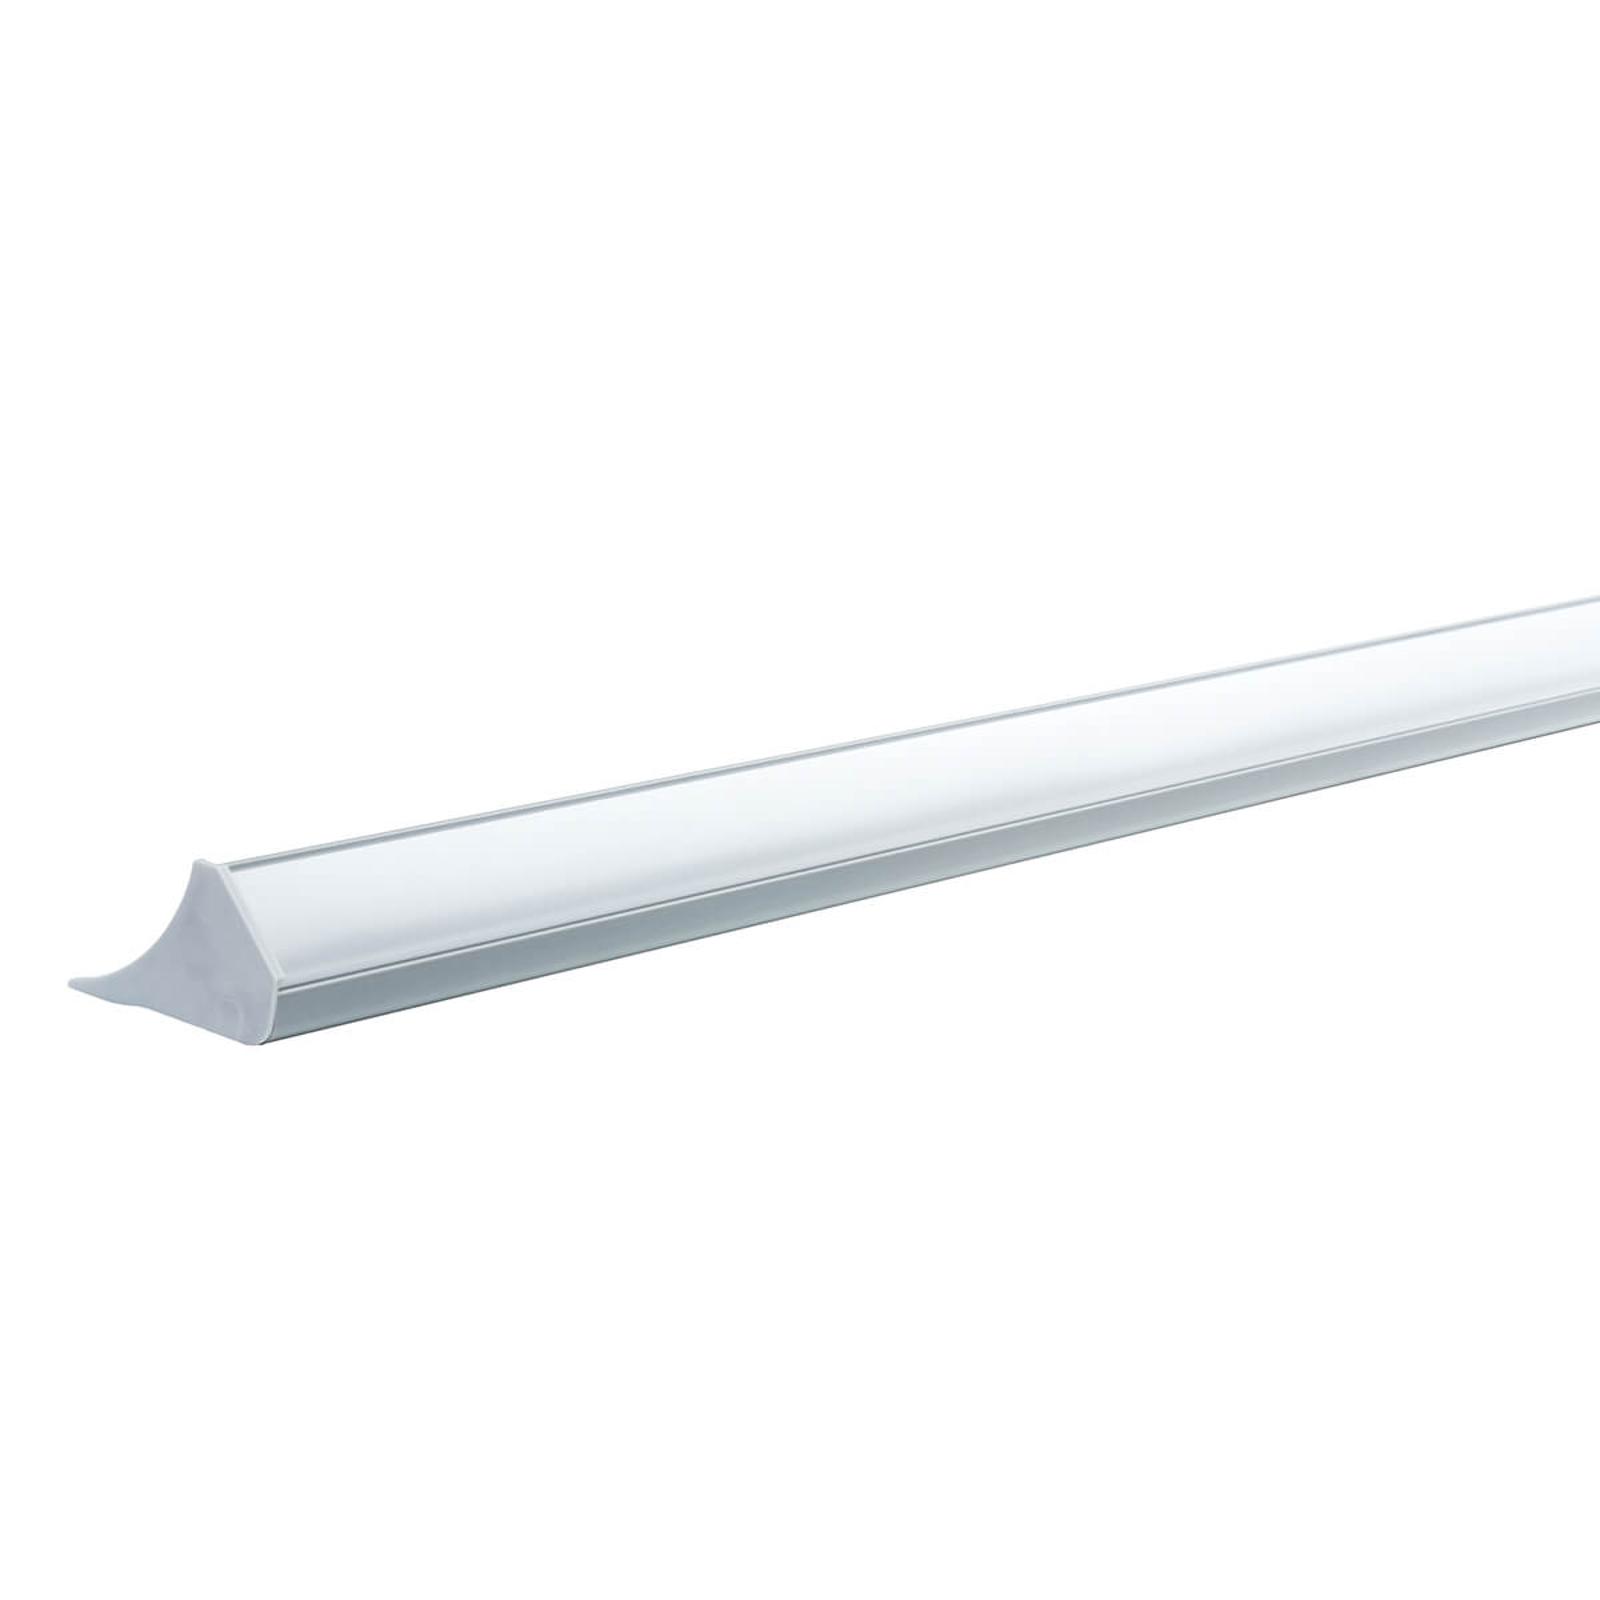 Paulmann Corner Profil für LED-Stripes, 2m